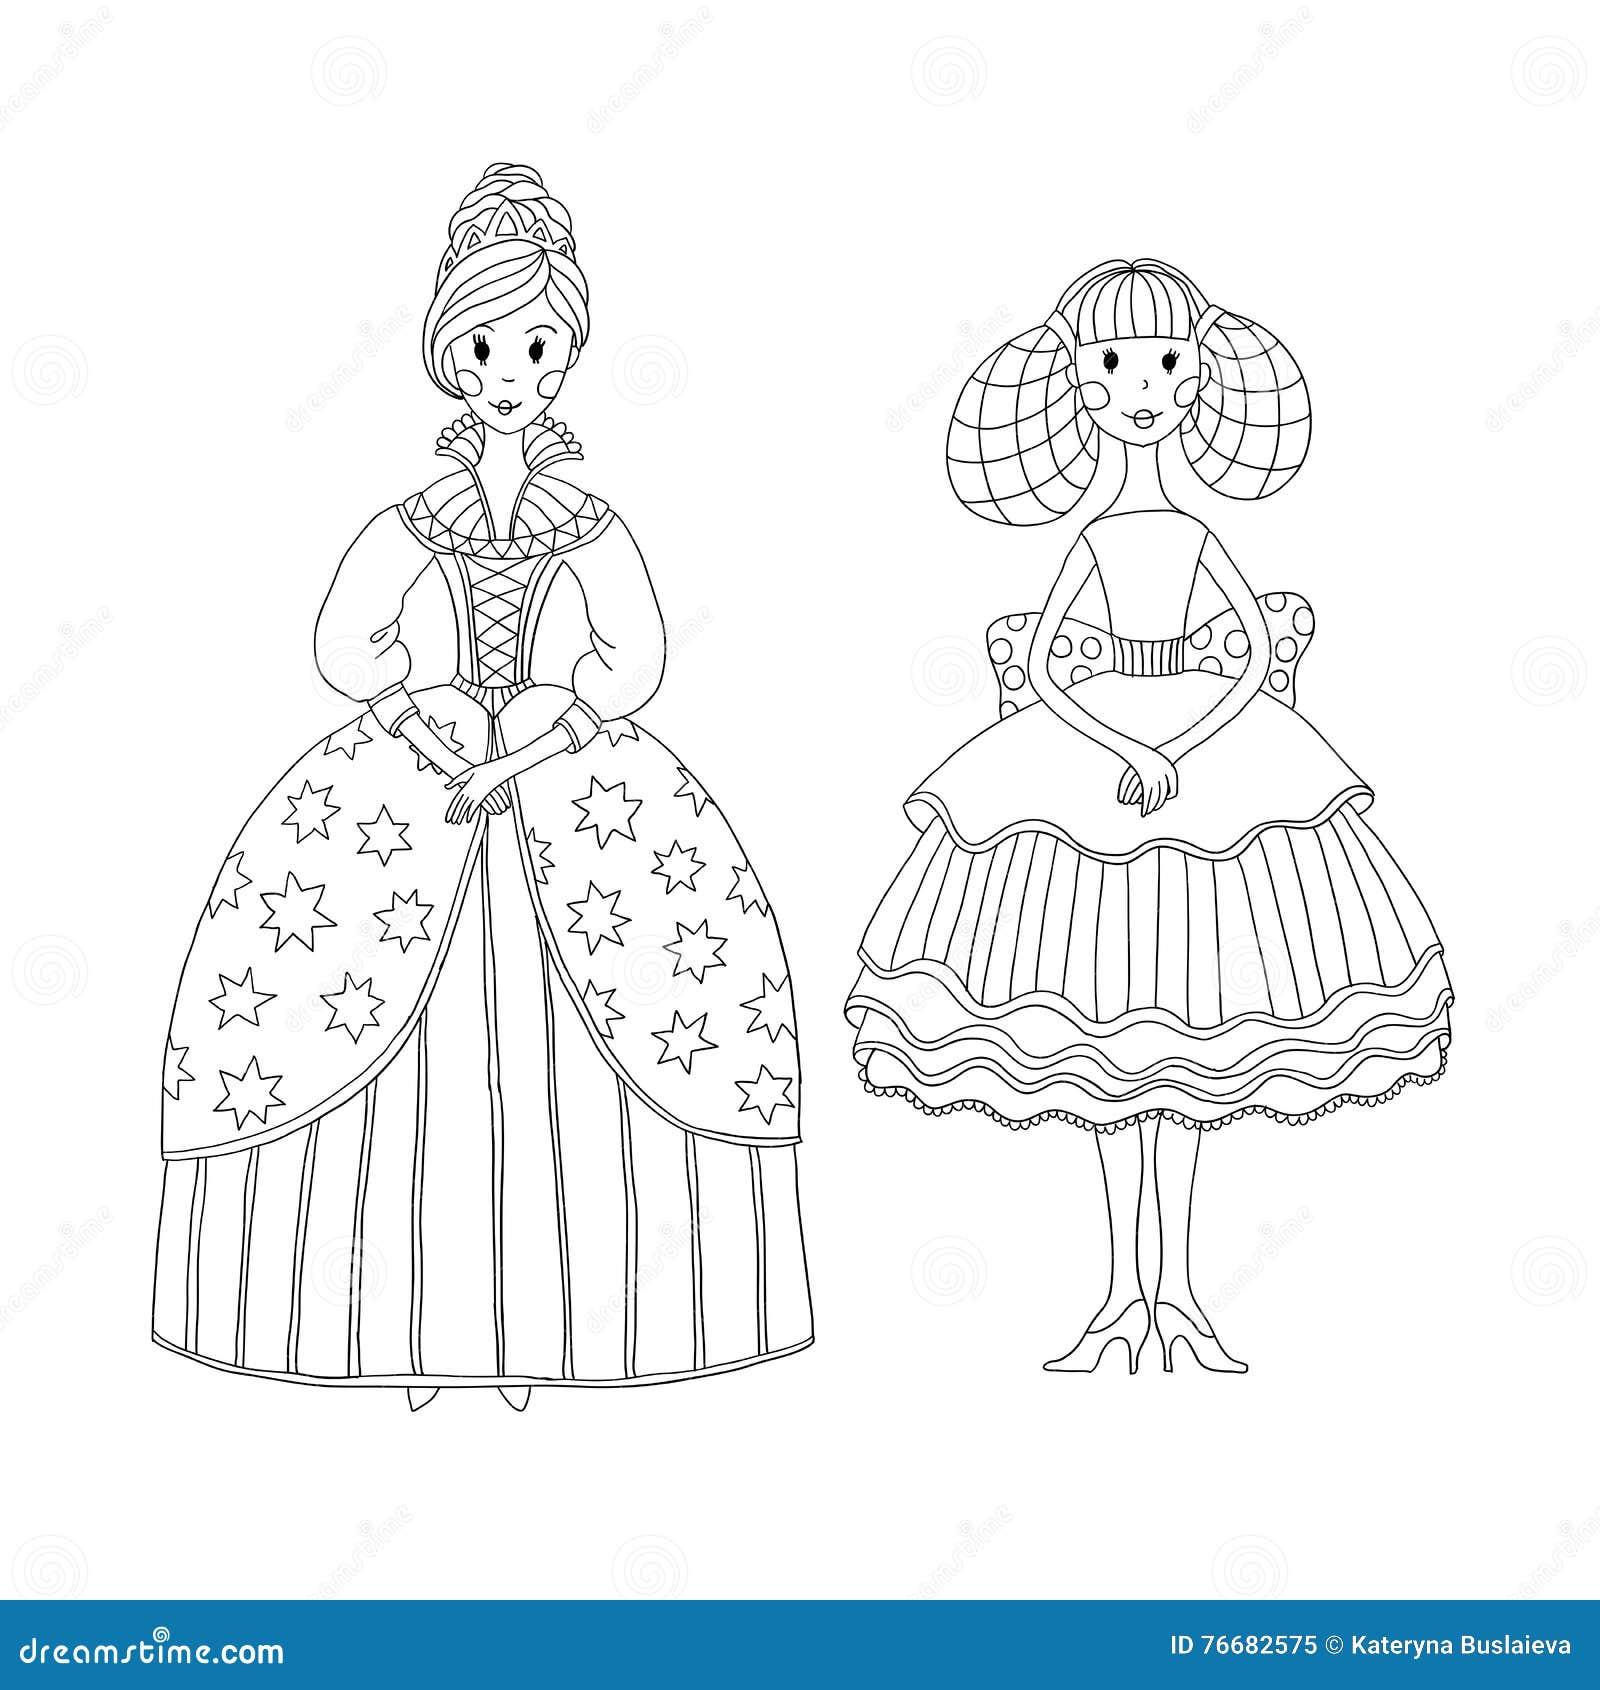 Coloriage Dessin Anime Ballerina.Princesse Et Ballerine Pour Livre De Coloriage Illustration De